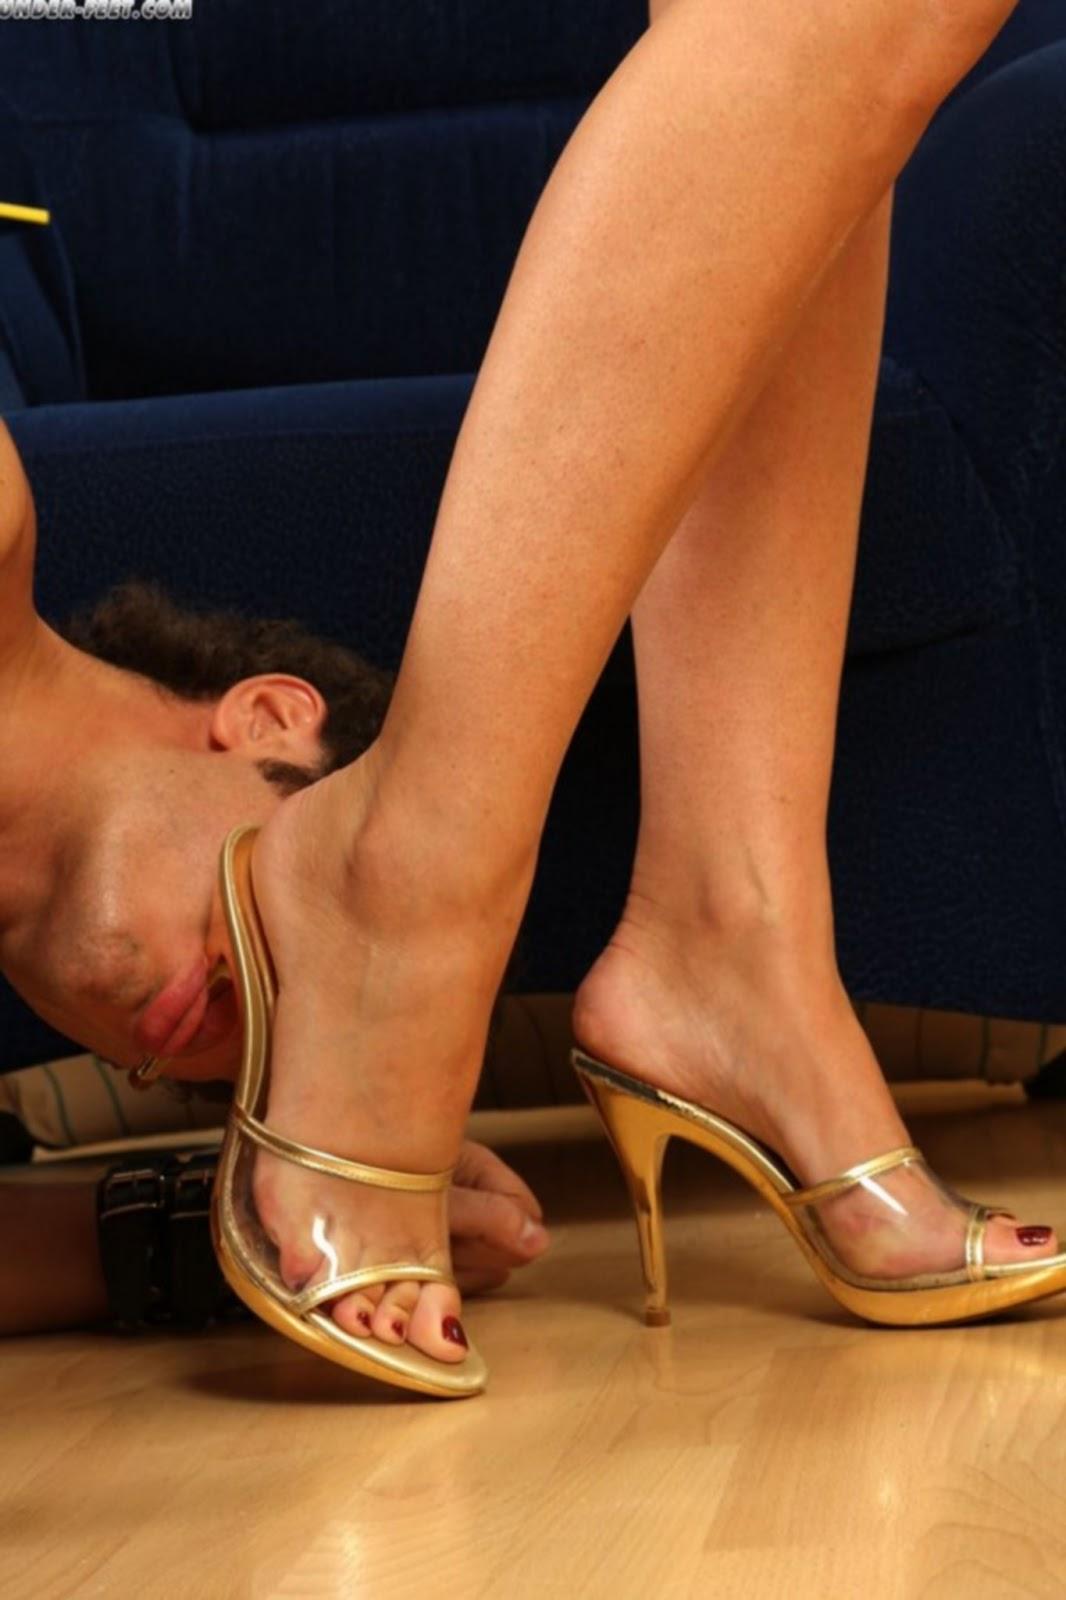 Foot Sex Stories 66